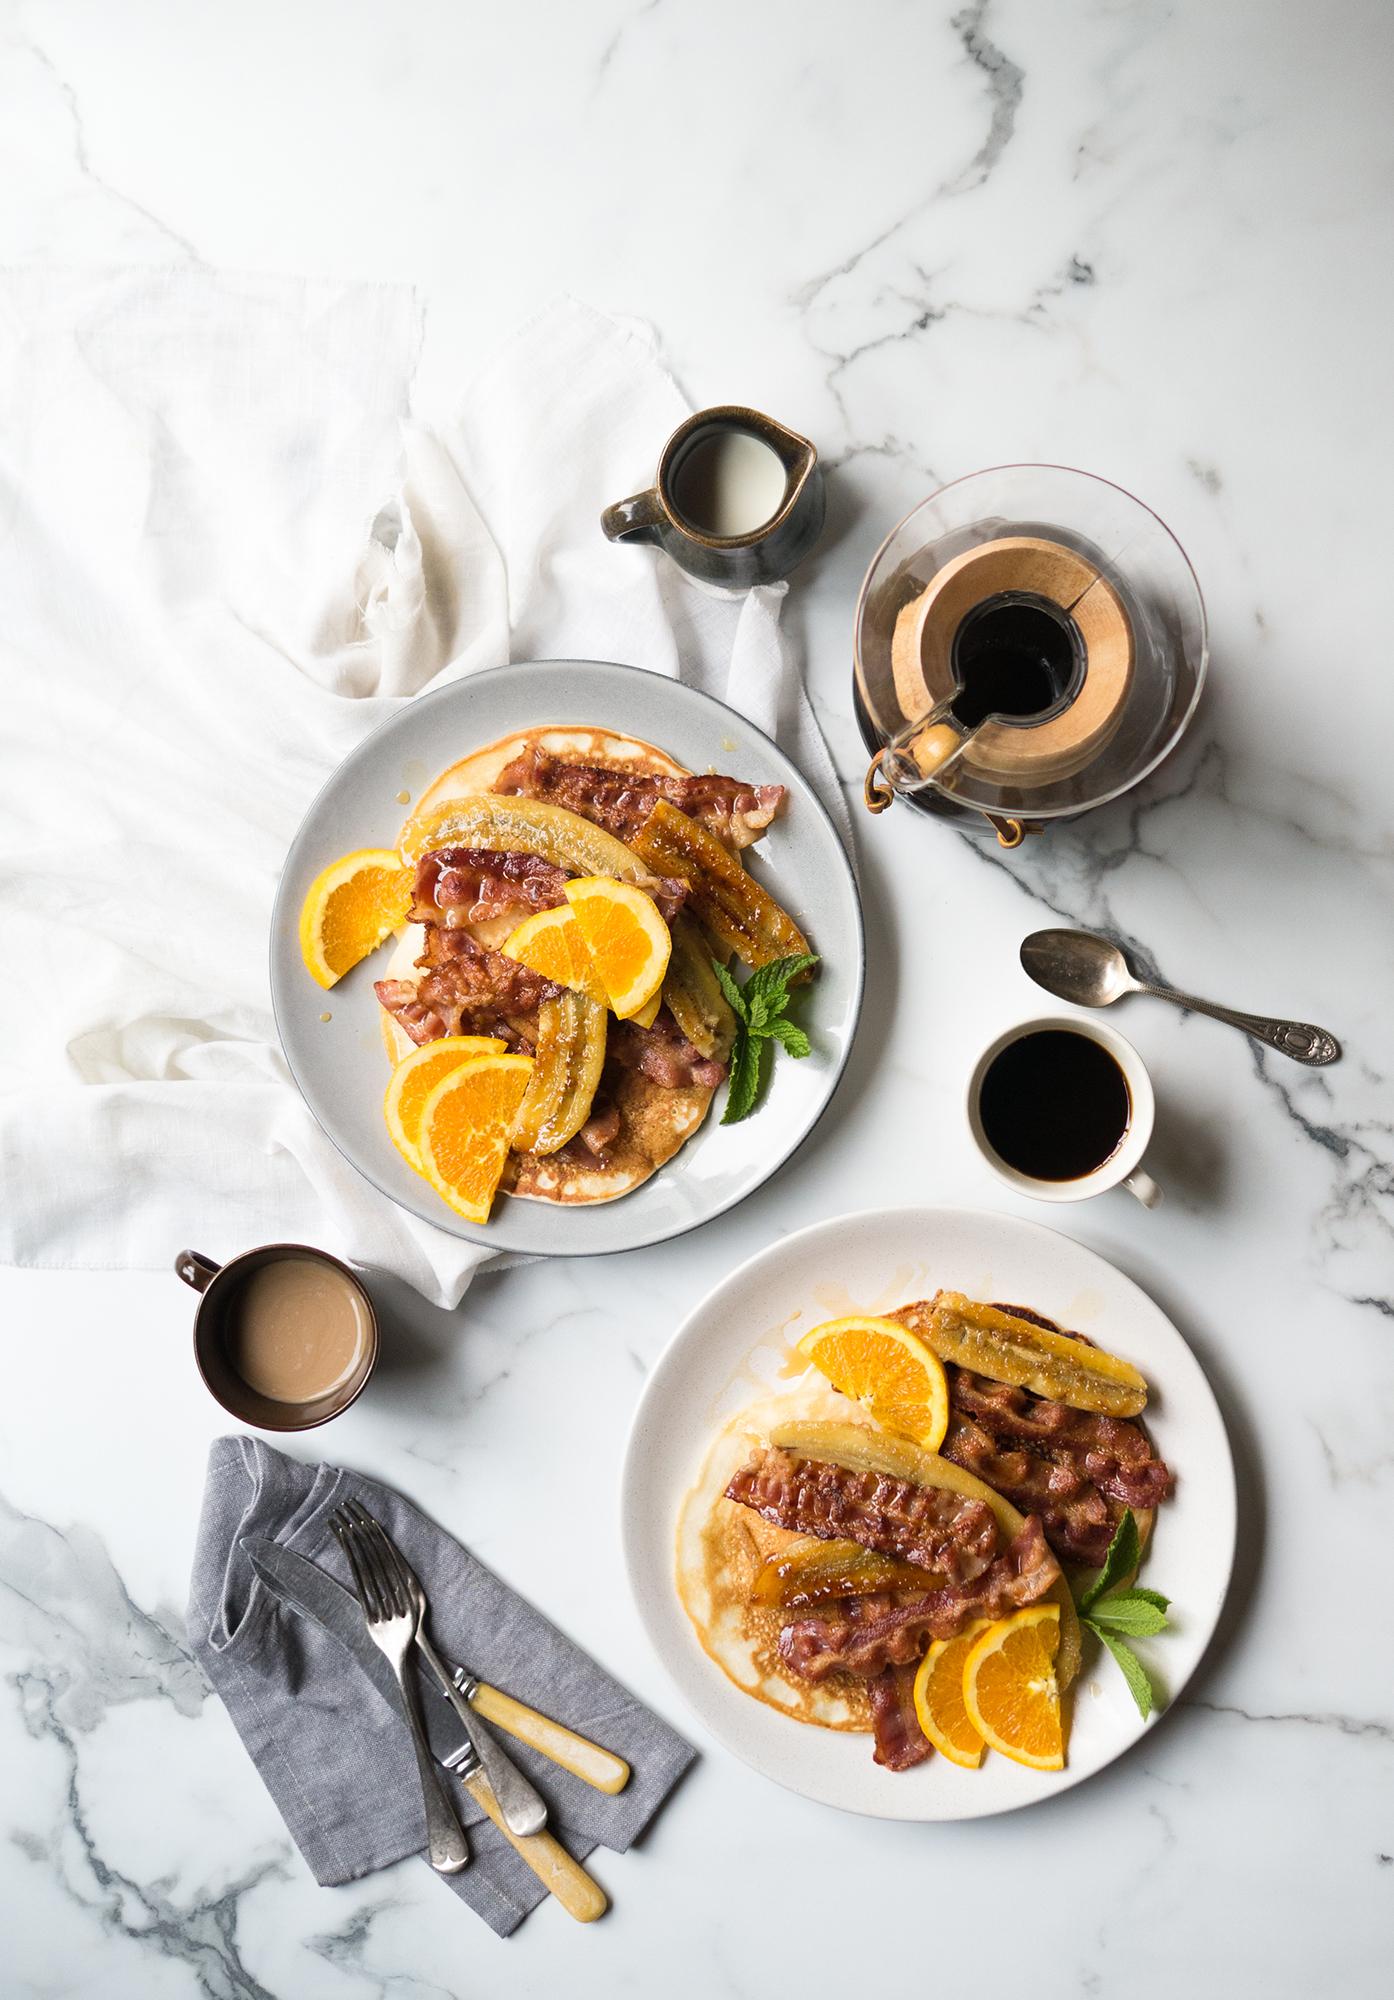 FARMLAND FOODS - Bacon Promo